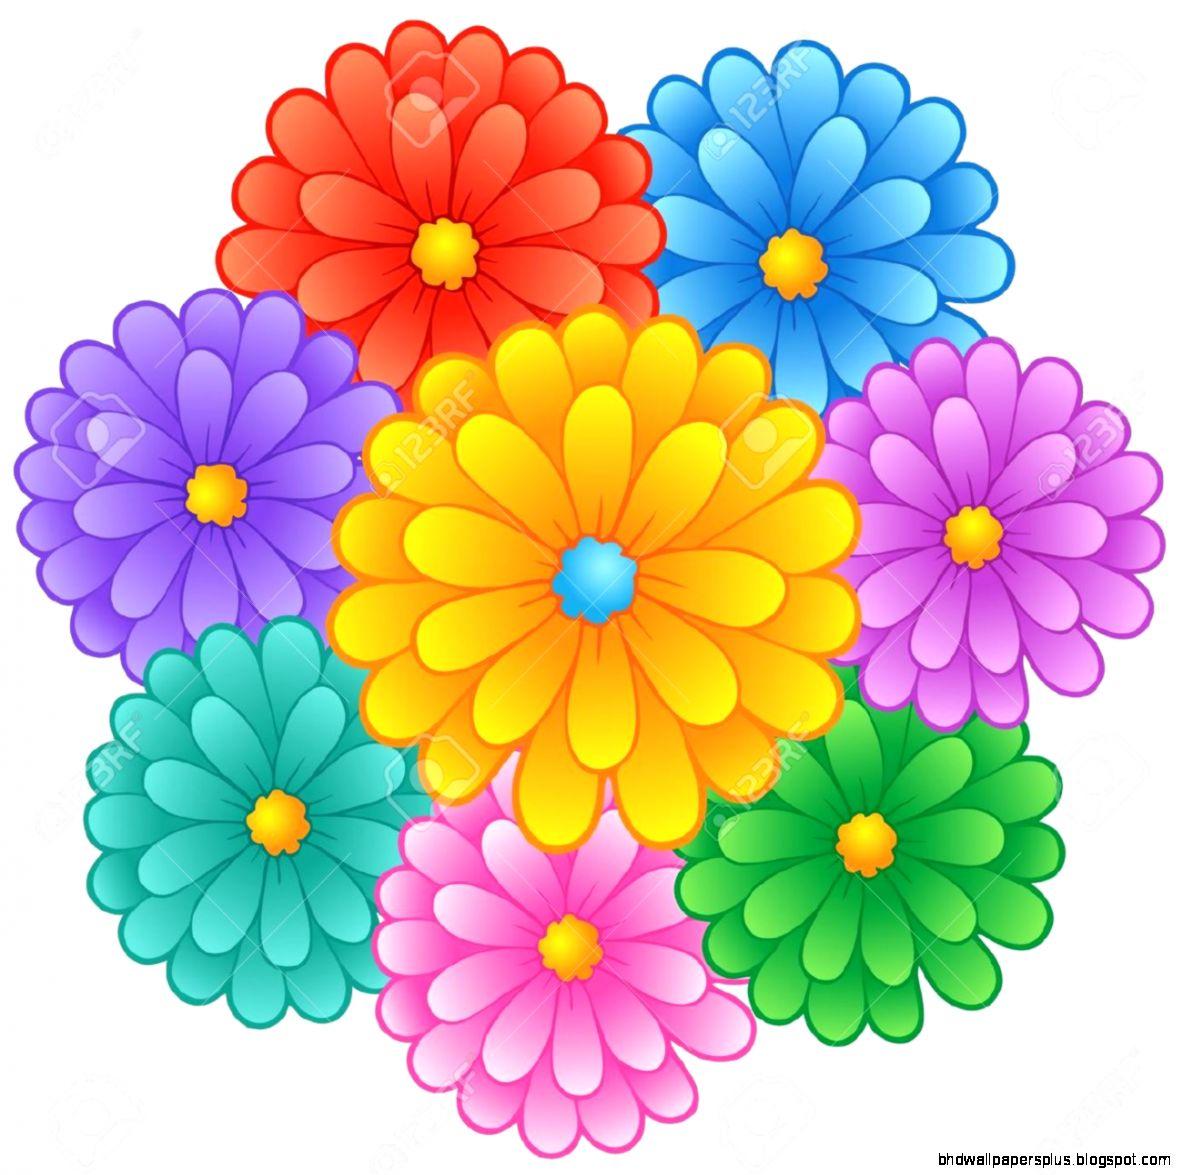 1183x1175 Cartoon Flowers Hd Wallpapers Plus